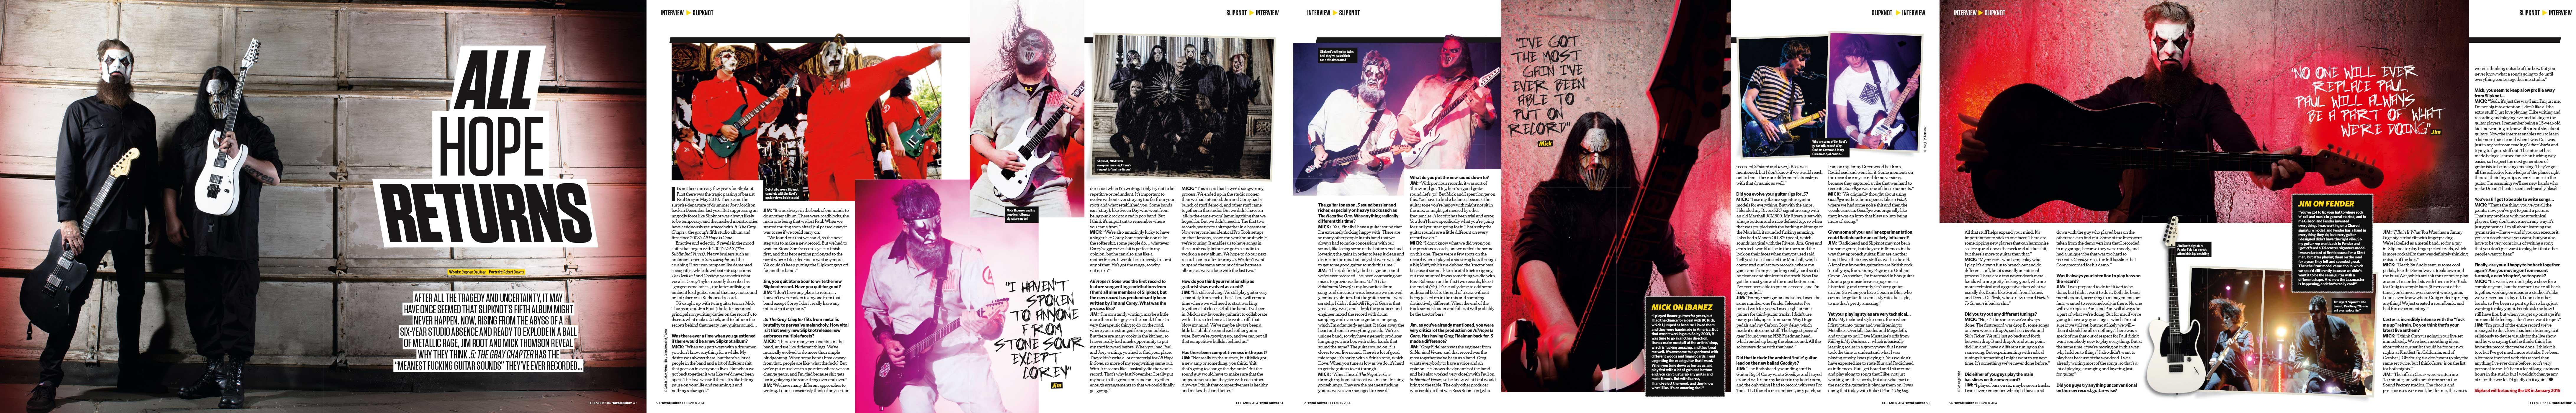 Total Guitar Slipknot Slipknot Cover Feature — Total